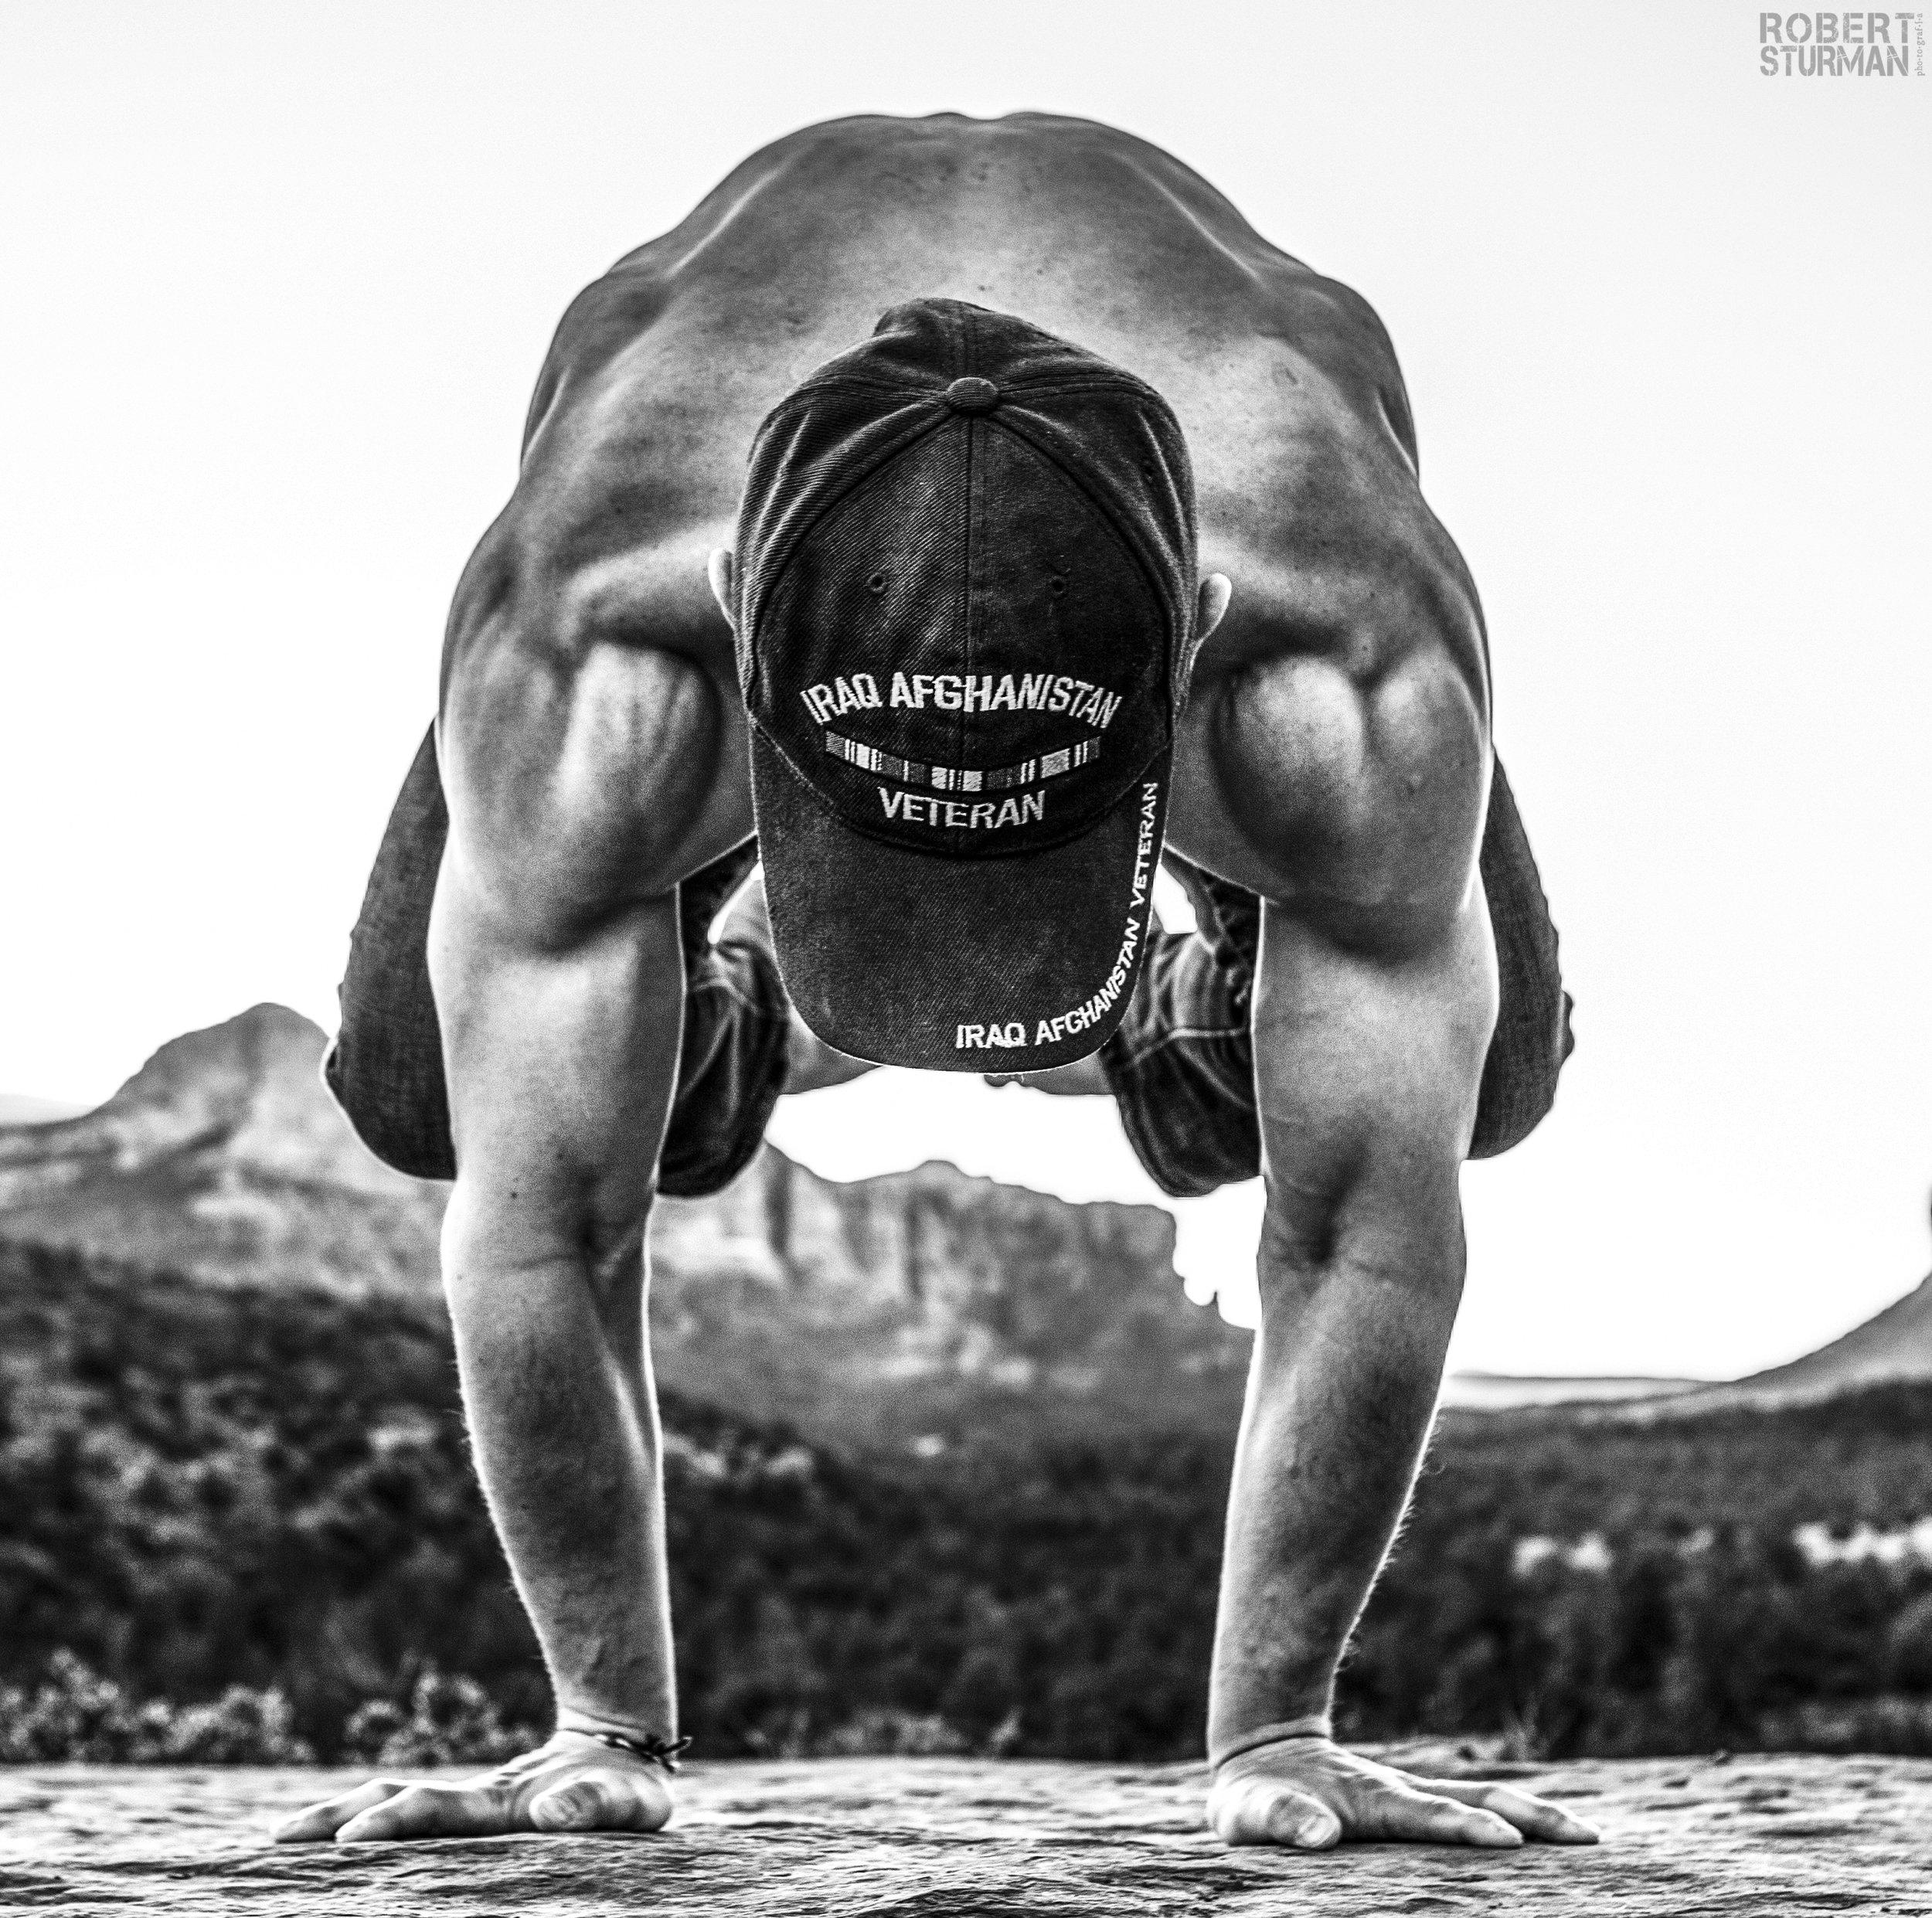 PHOTO:  Robert Sturman  | Veteran:  LUKE ANDERSEN  and  The   Give Back Yoga Foundation .